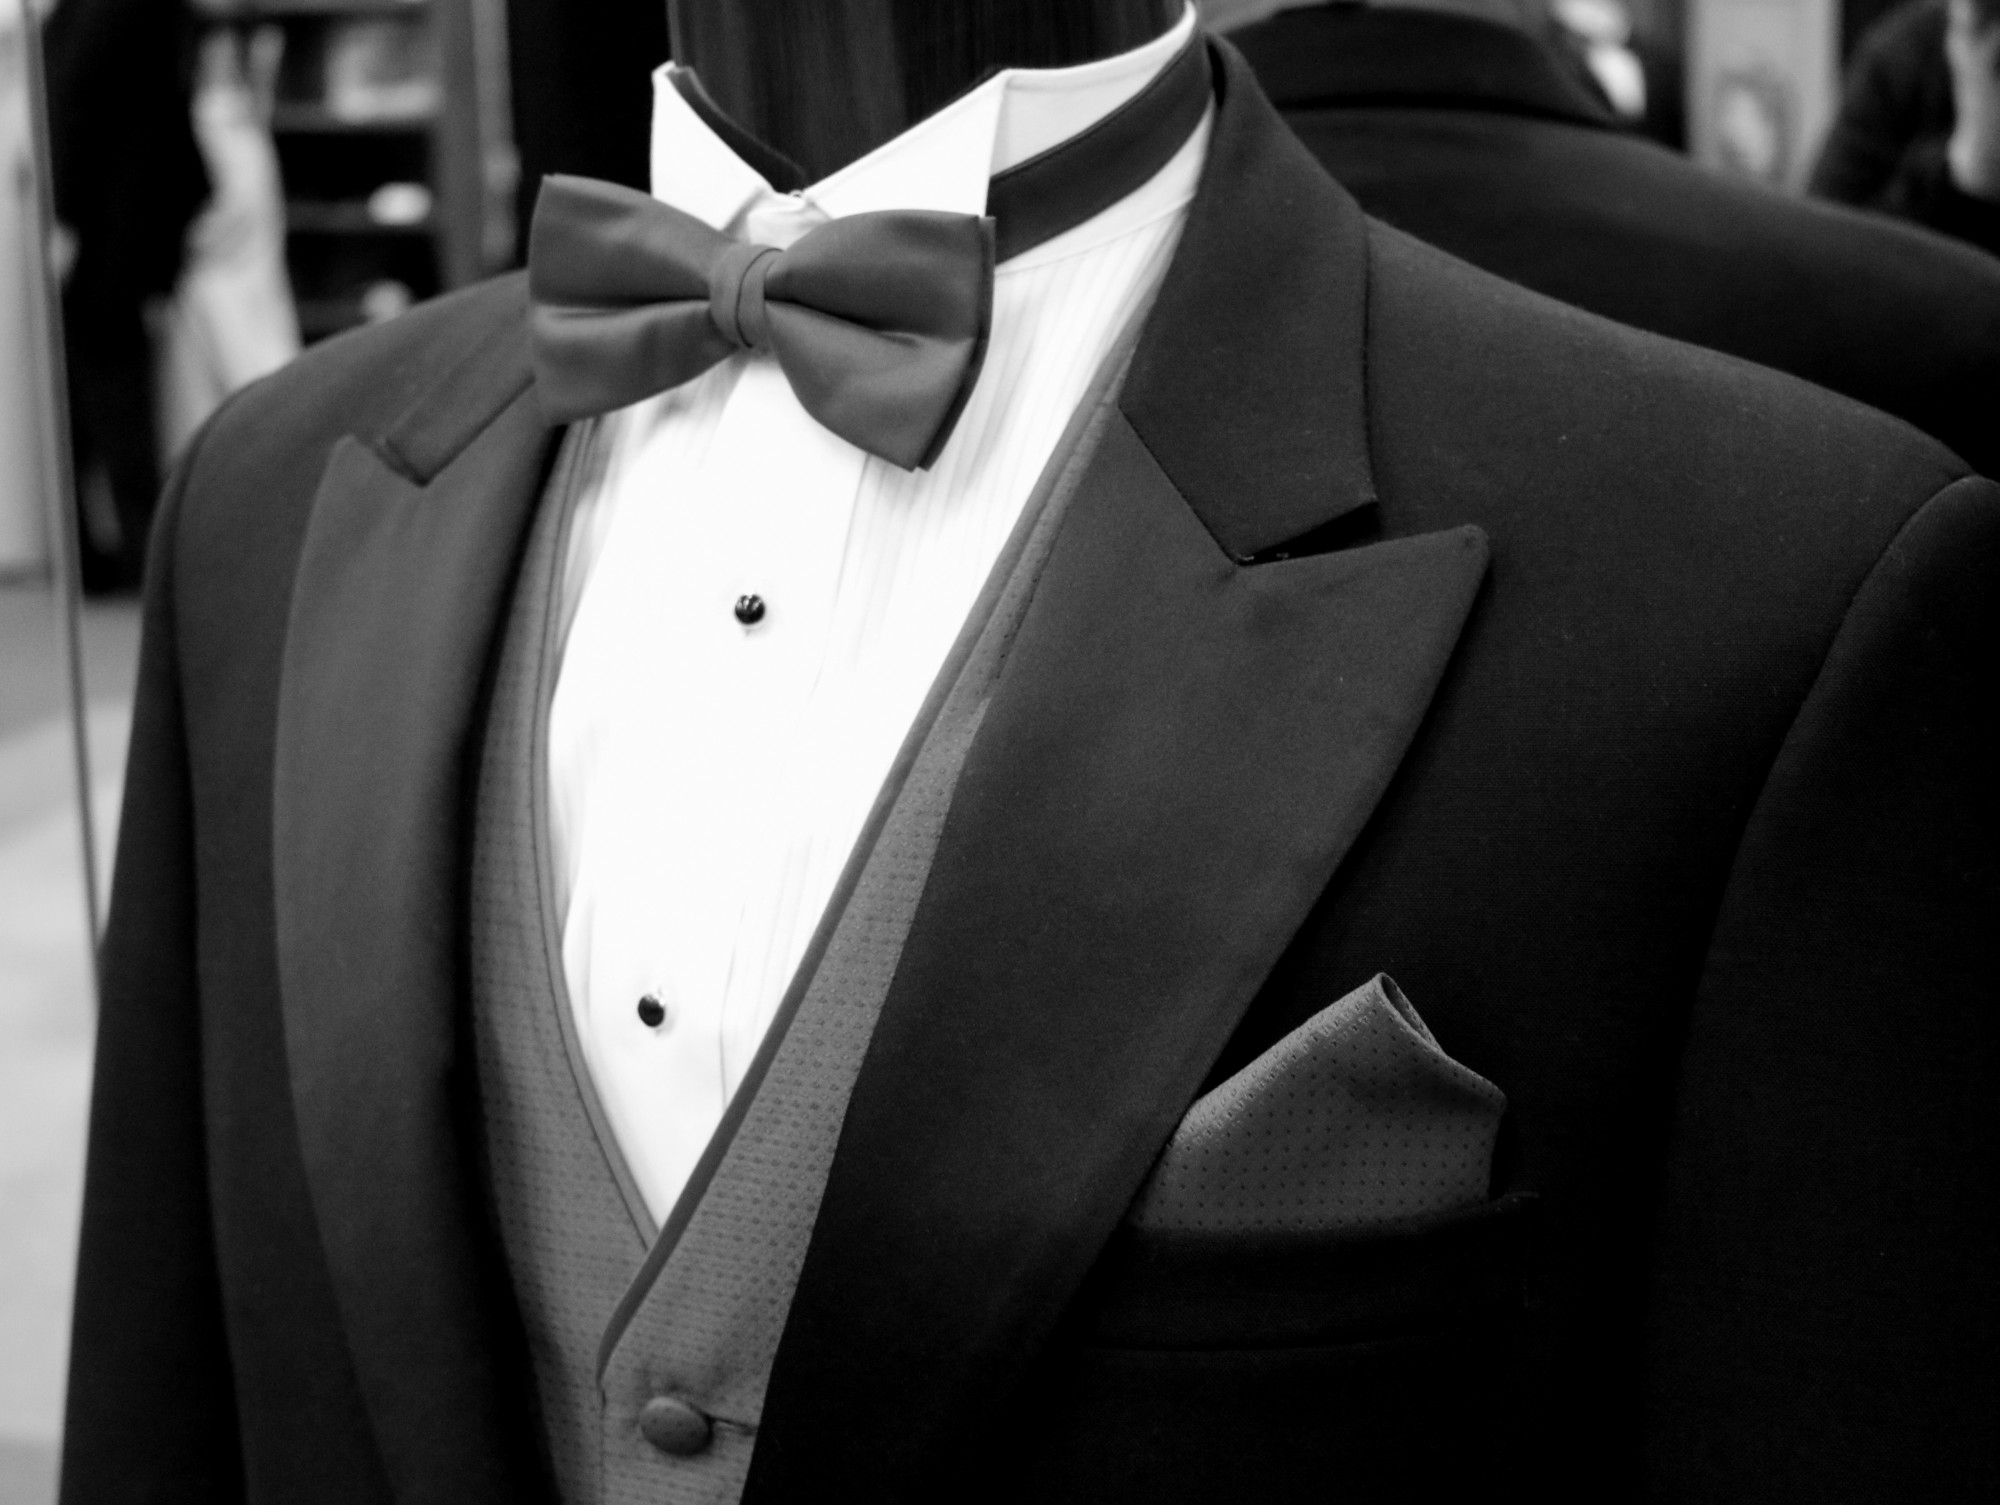 wedding tuxido